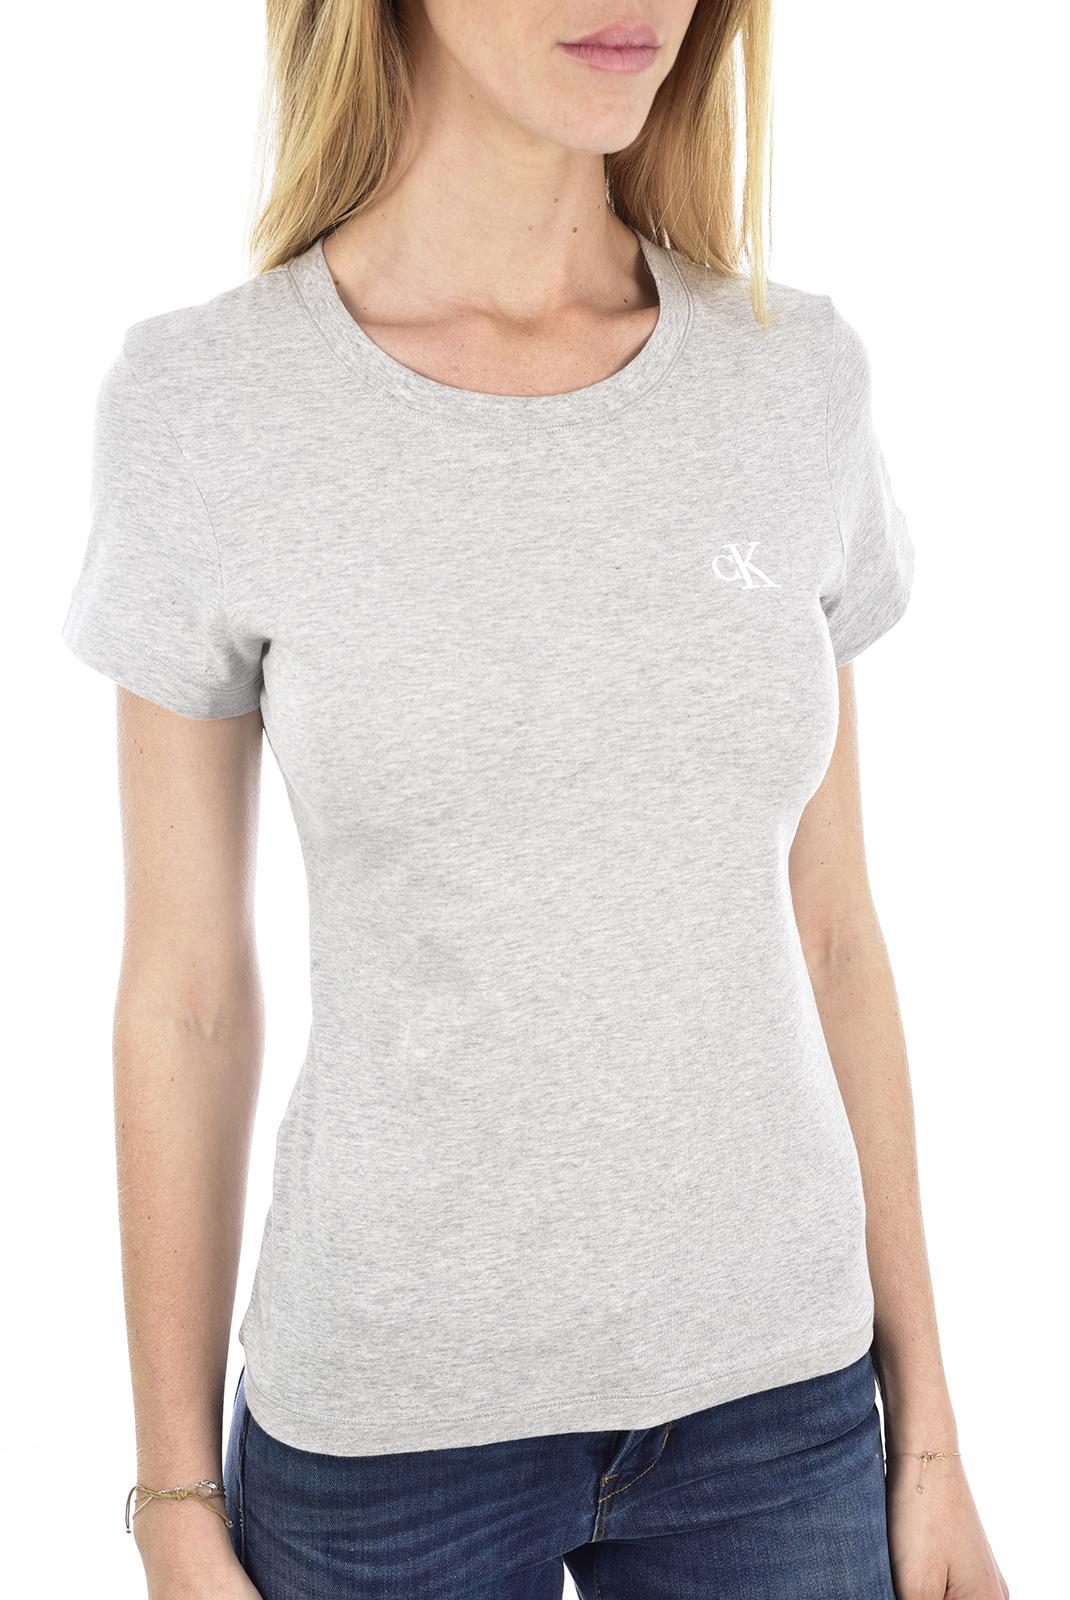 Tee shirt  Calvin klein J20J212883 P01 LIGHT GREY